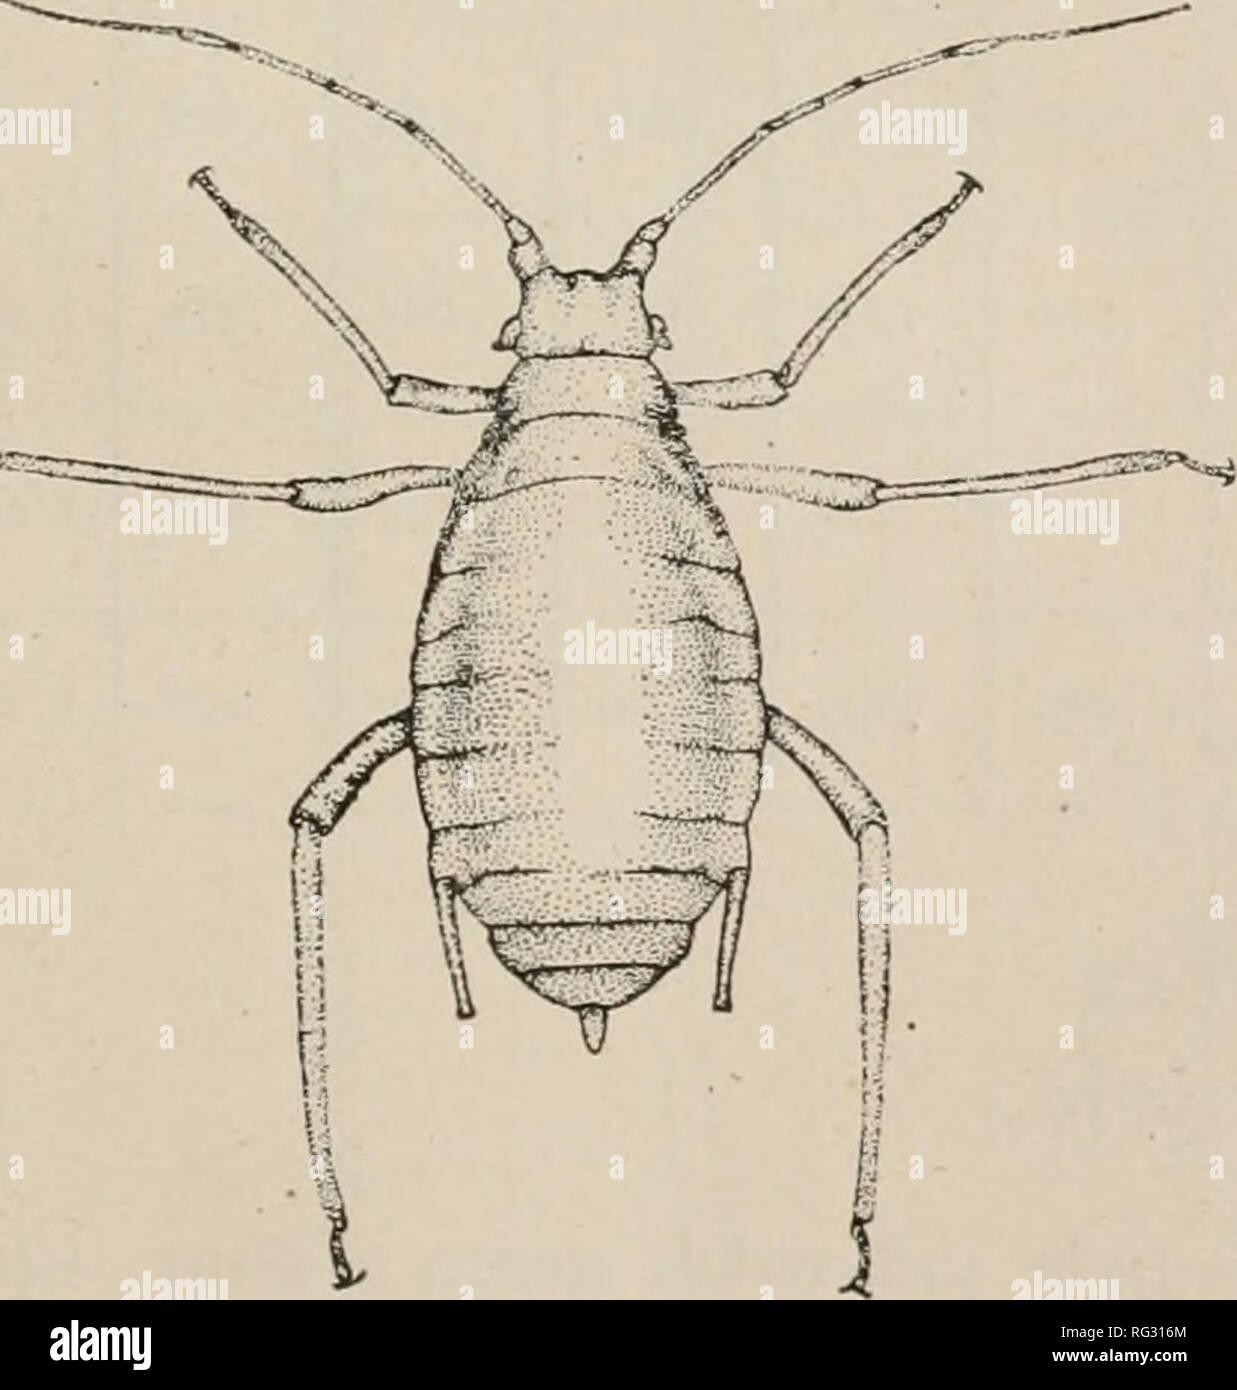 . The Canadian entomologist. Insects; Entomology. THE CANADIAN ENTOMOLOGIST 131 Locality, Date, Etc. I. II. III. IV. V. VI. (base) VI. (fila- ment) Total. La Fayette. Ind. (Idaho specimens) Wheat, Oct. 21, 1912 mm. .087 mm. .070 mm. .617 mm. .389 mm. .383 mm. .148 mm. .626 mm. 2.319 La Fayette, Ind. (Idaho specimens) Wheat, Nov. 1, 1912 .087 .070 .685 .459 .435 .174 .696 2.606 La Fayette, Ind. (Idaho specimens) Wheat, Nov. 1, 1912 .087 .070 .678 .452 .435 .156 .696 2. 574 La Fayette, Ind. (Idaho snecimens) Wheat. Nov. 1, 1912 .087 .070 .643 .383 .400 .156 . 635 2.374 La Fayette. Ind. (Idaho sp - Stock Image